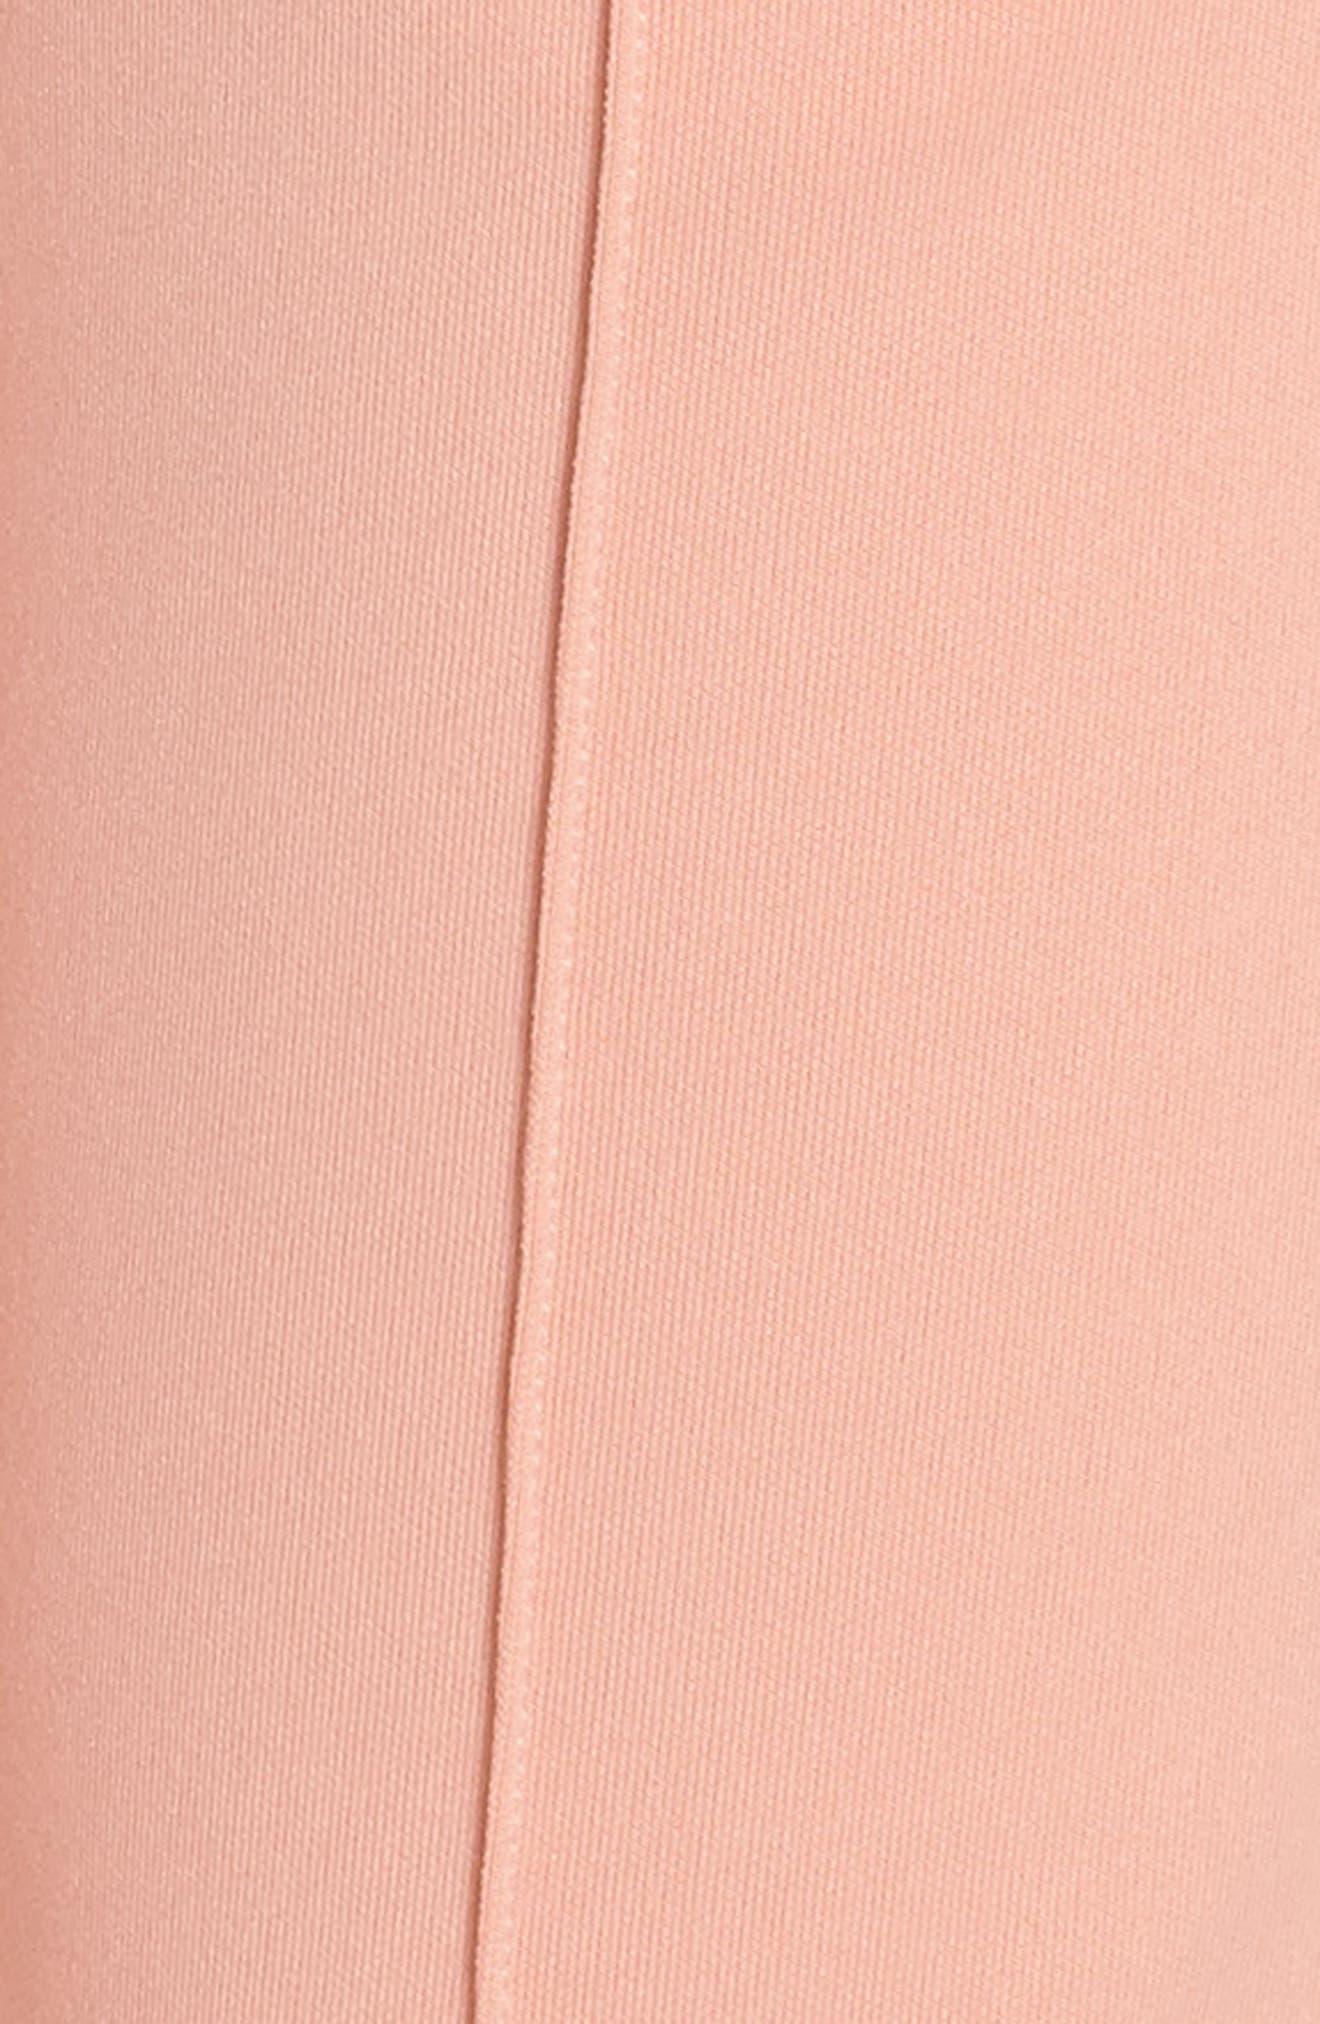 ,                             adidas SST Track Pants,                             Alternate thumbnail 100, color,                             653